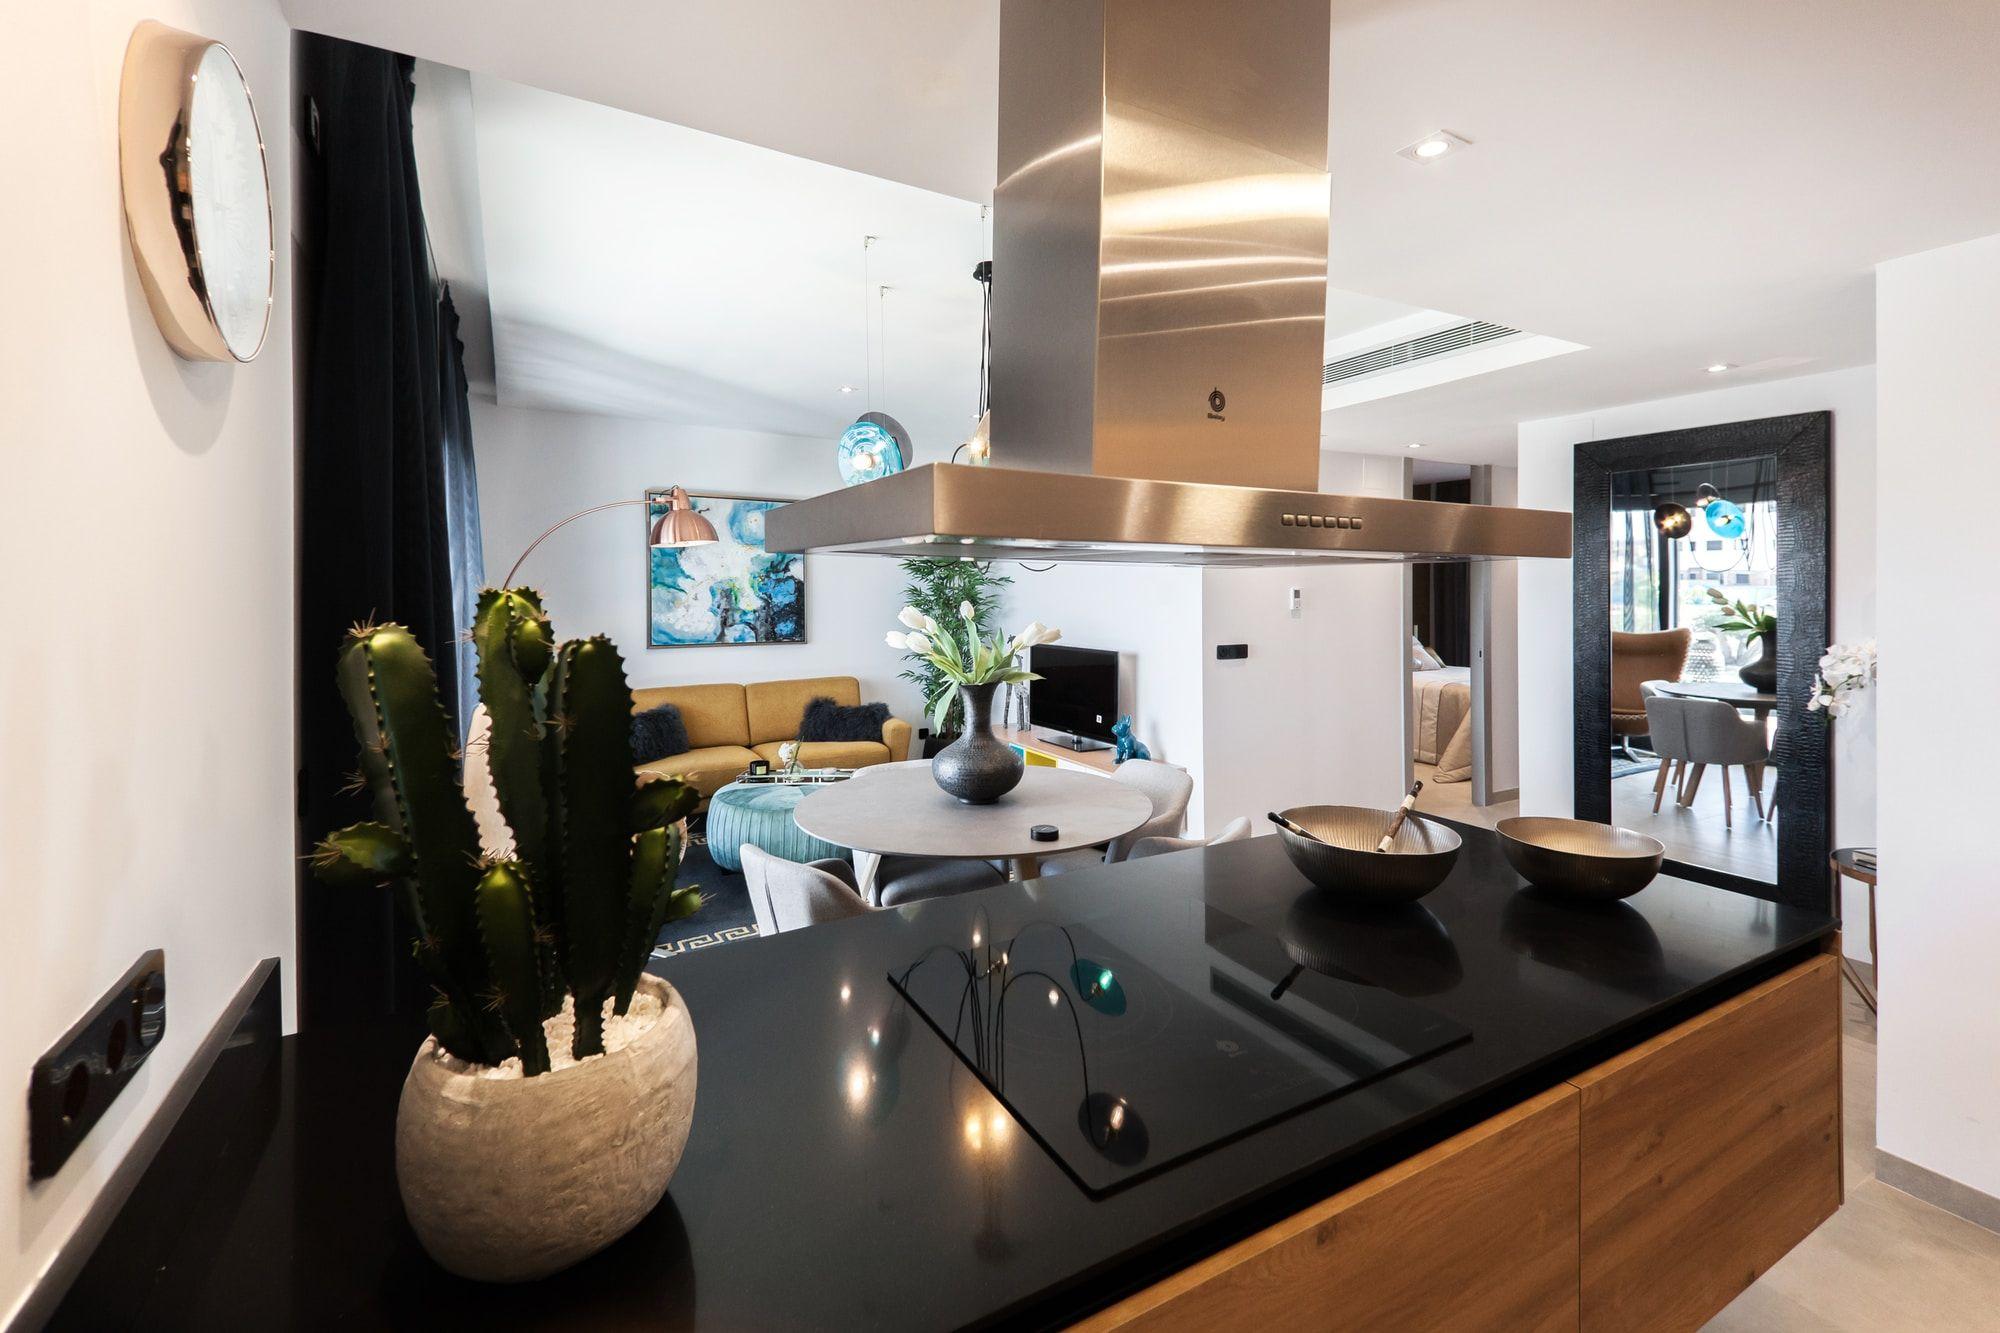 Kitchen Renovations Mandurah & Peel By Peel Property Solutions